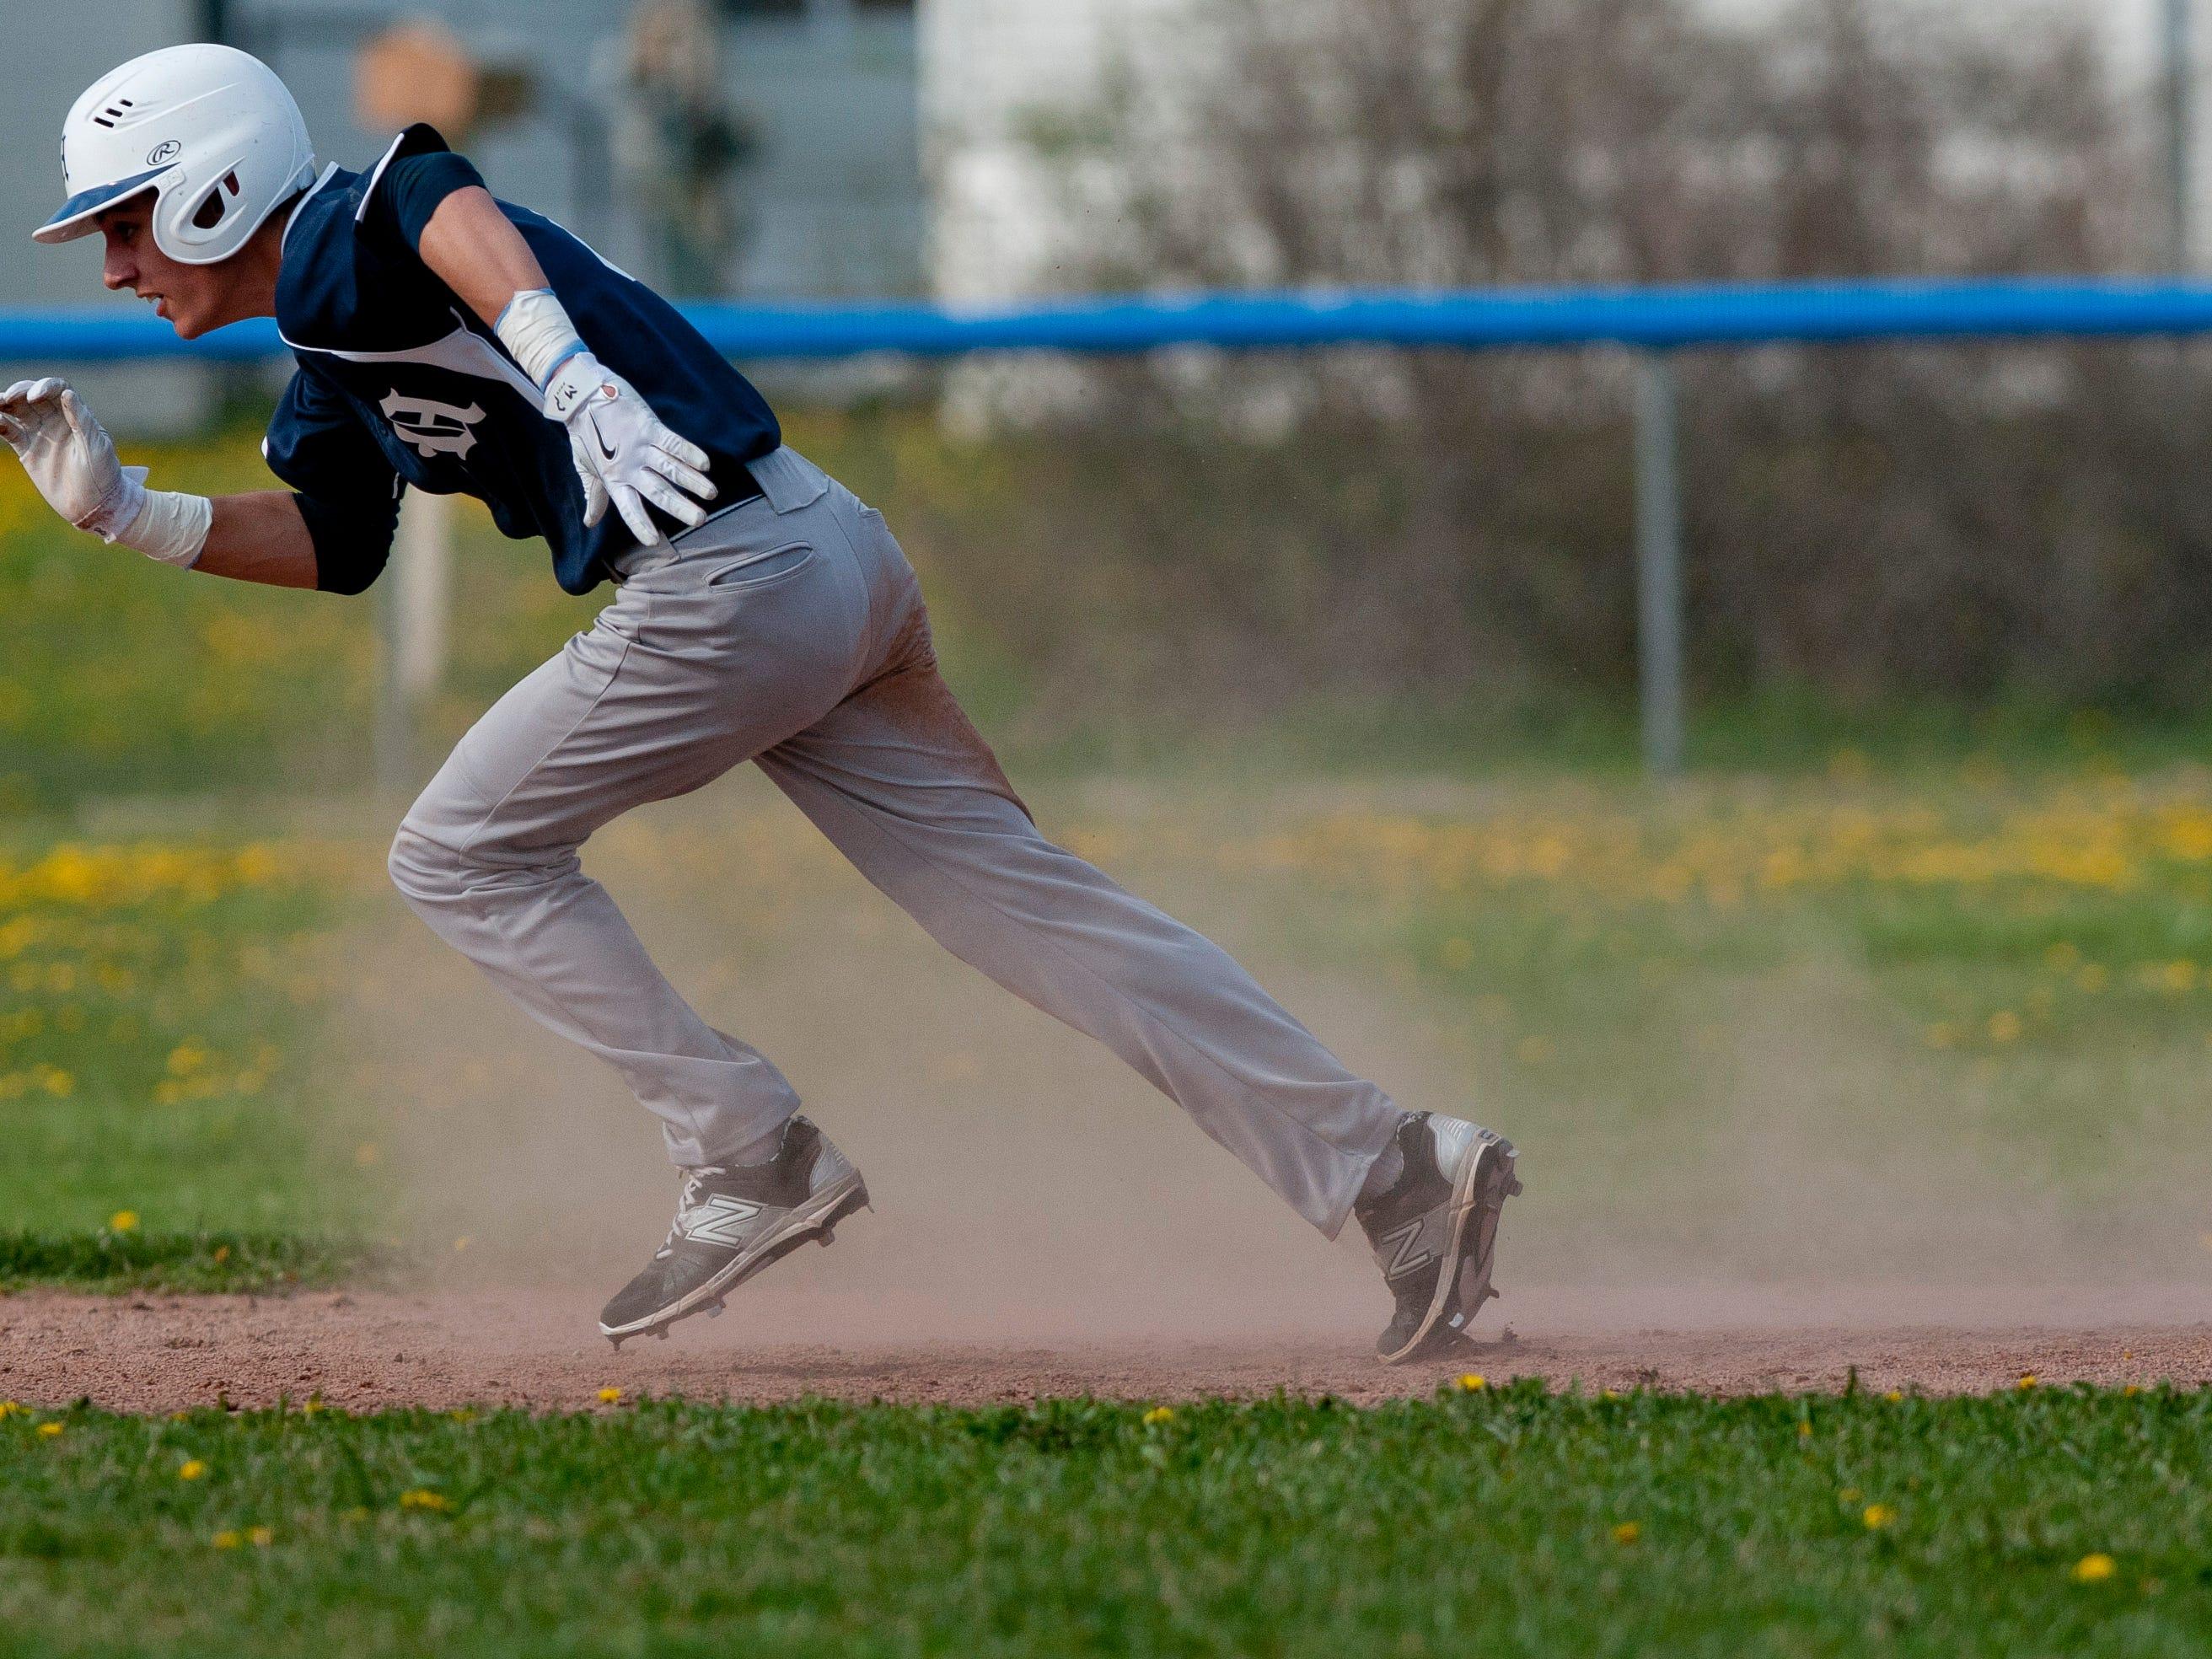 Marysville's Joe Koch runs for third during a baseball game Wednesday, May 6, 2015 at St. Clair High School.